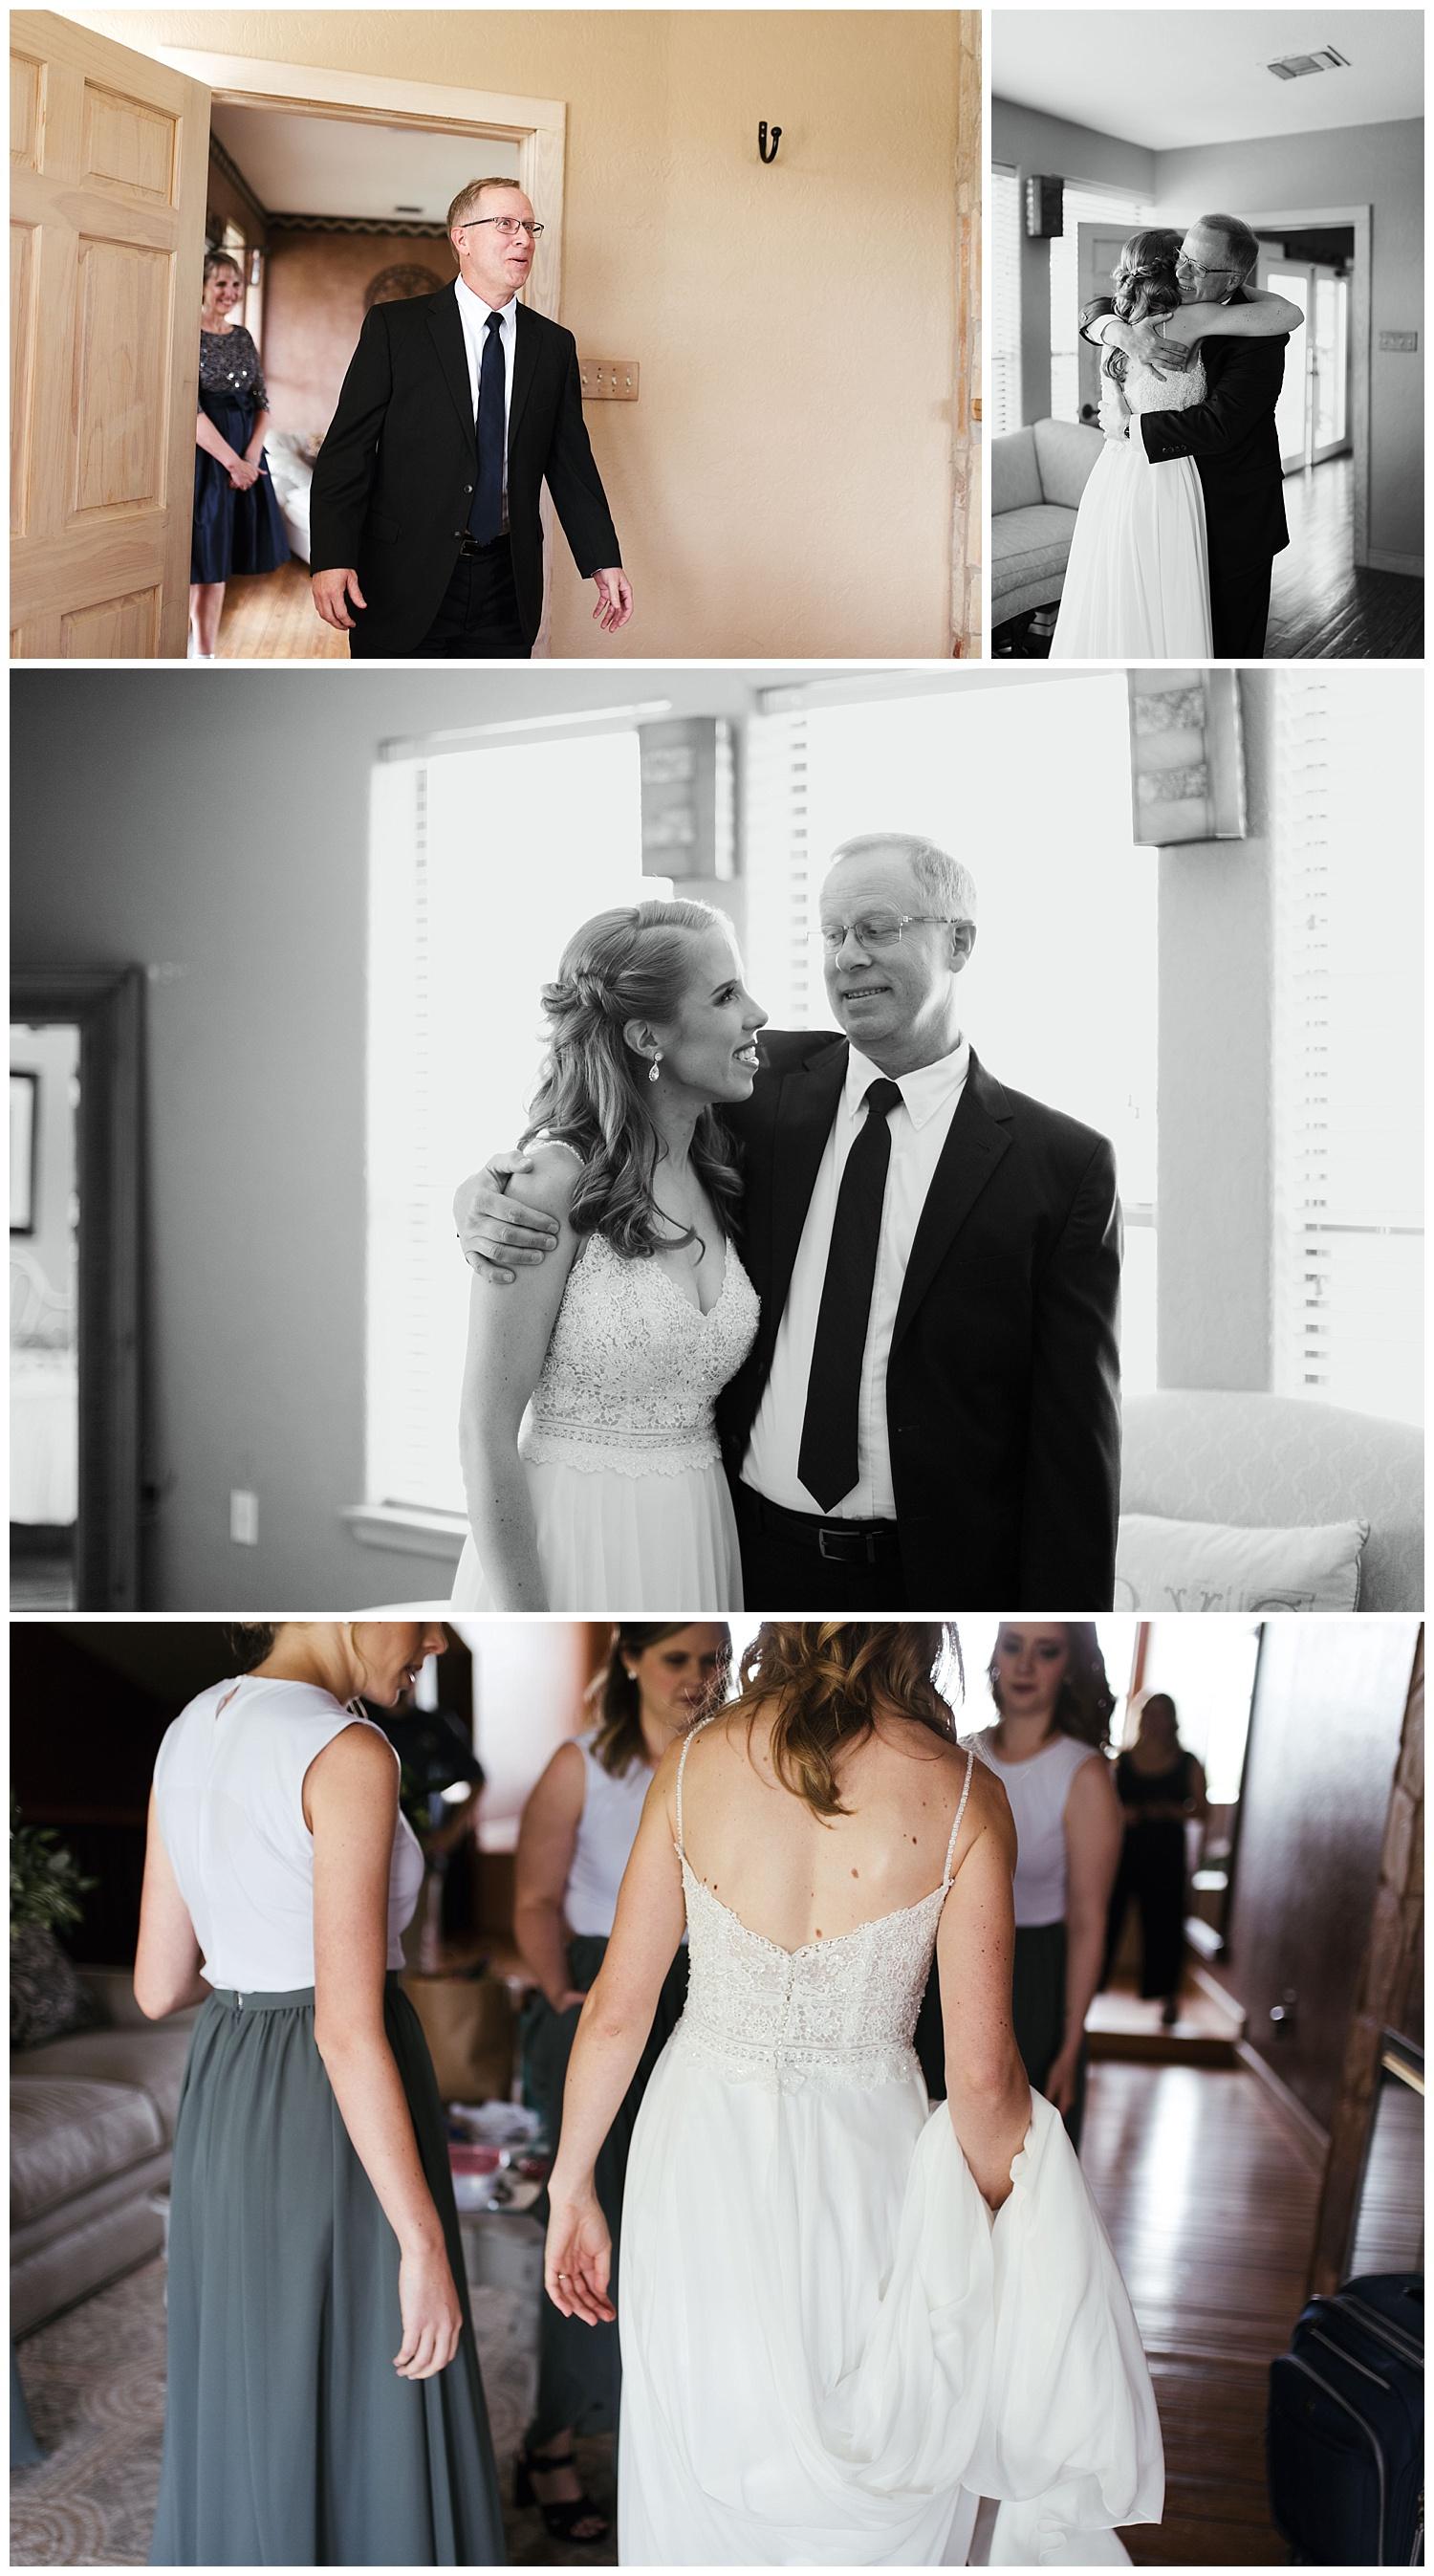 Dripping Springs, Texas Wedding | Memory Lane Event Center | Fort Worth Wedding Photographer | www.jordanmitchellphotography.com